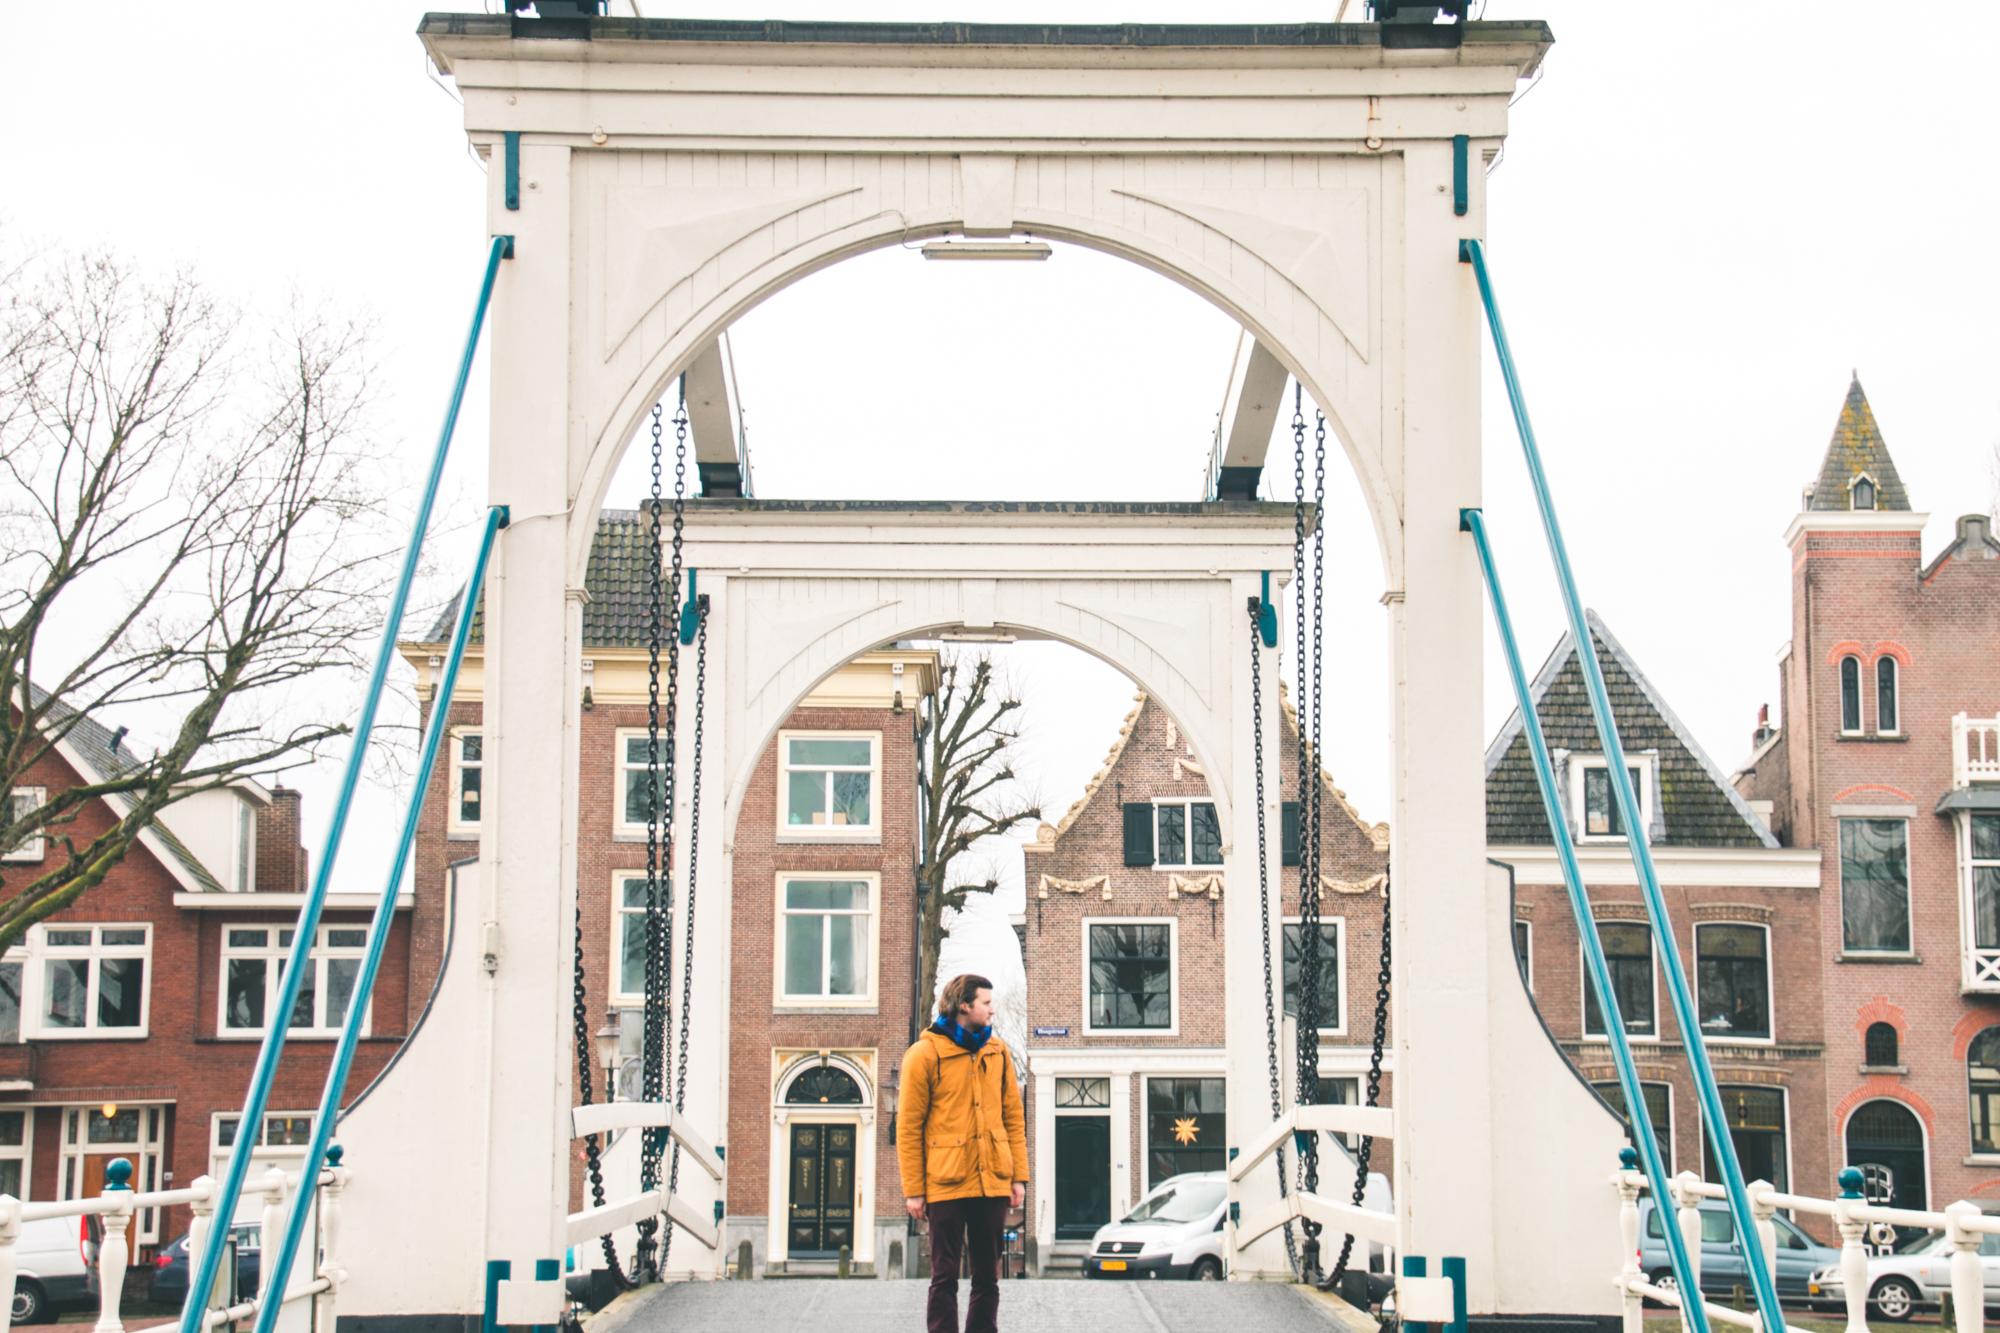 Weesp, Netherlands